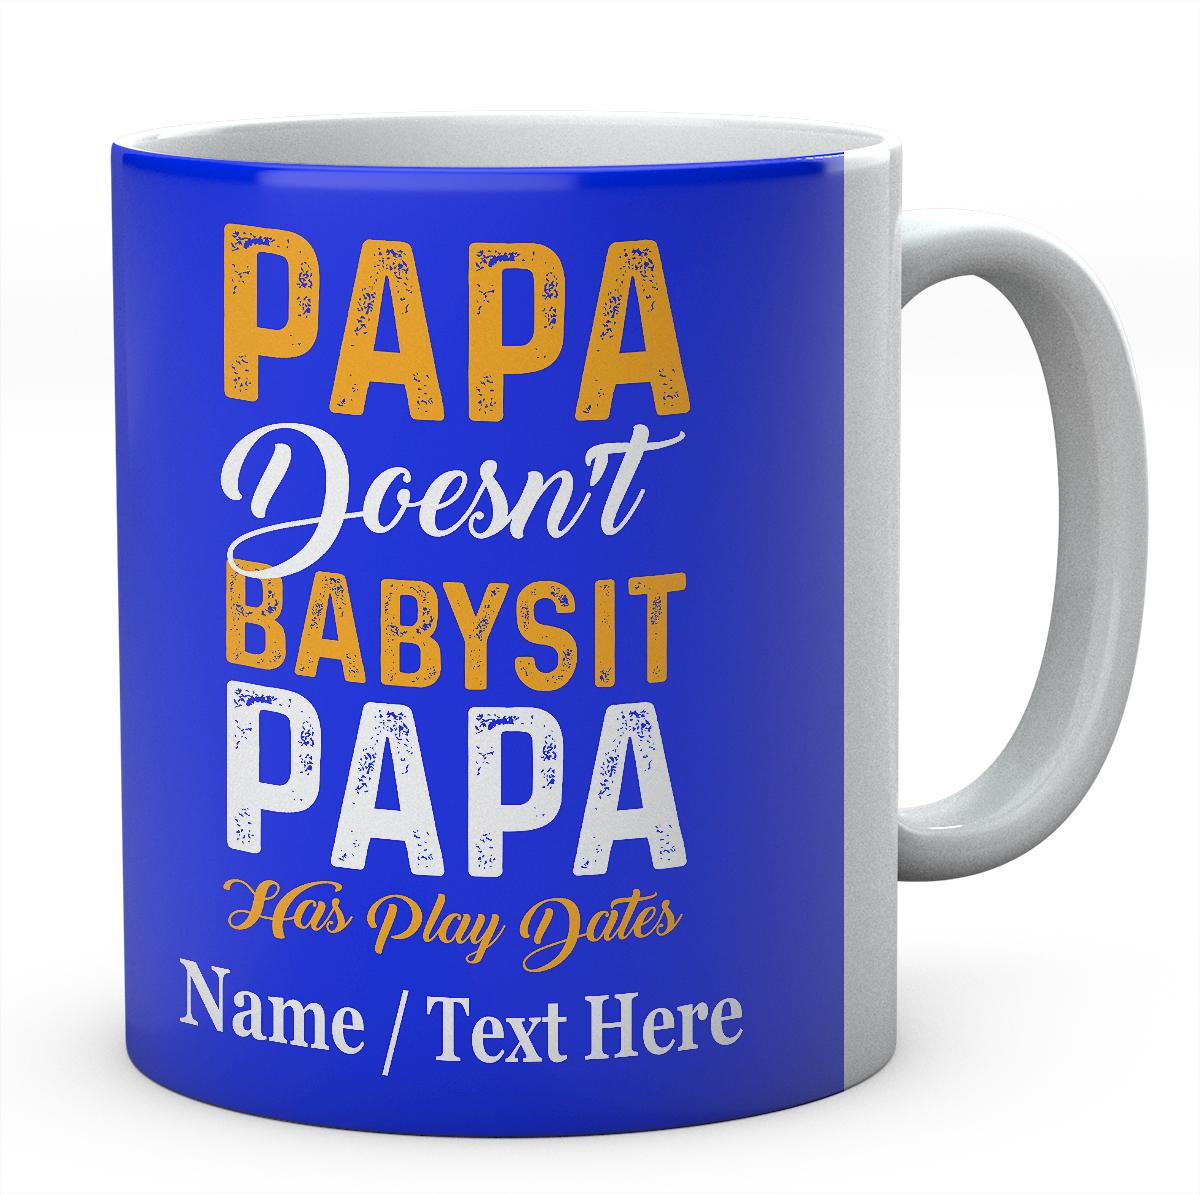 Papa Doesn't Babysit -Papa Has Play Dates-Printed Mug